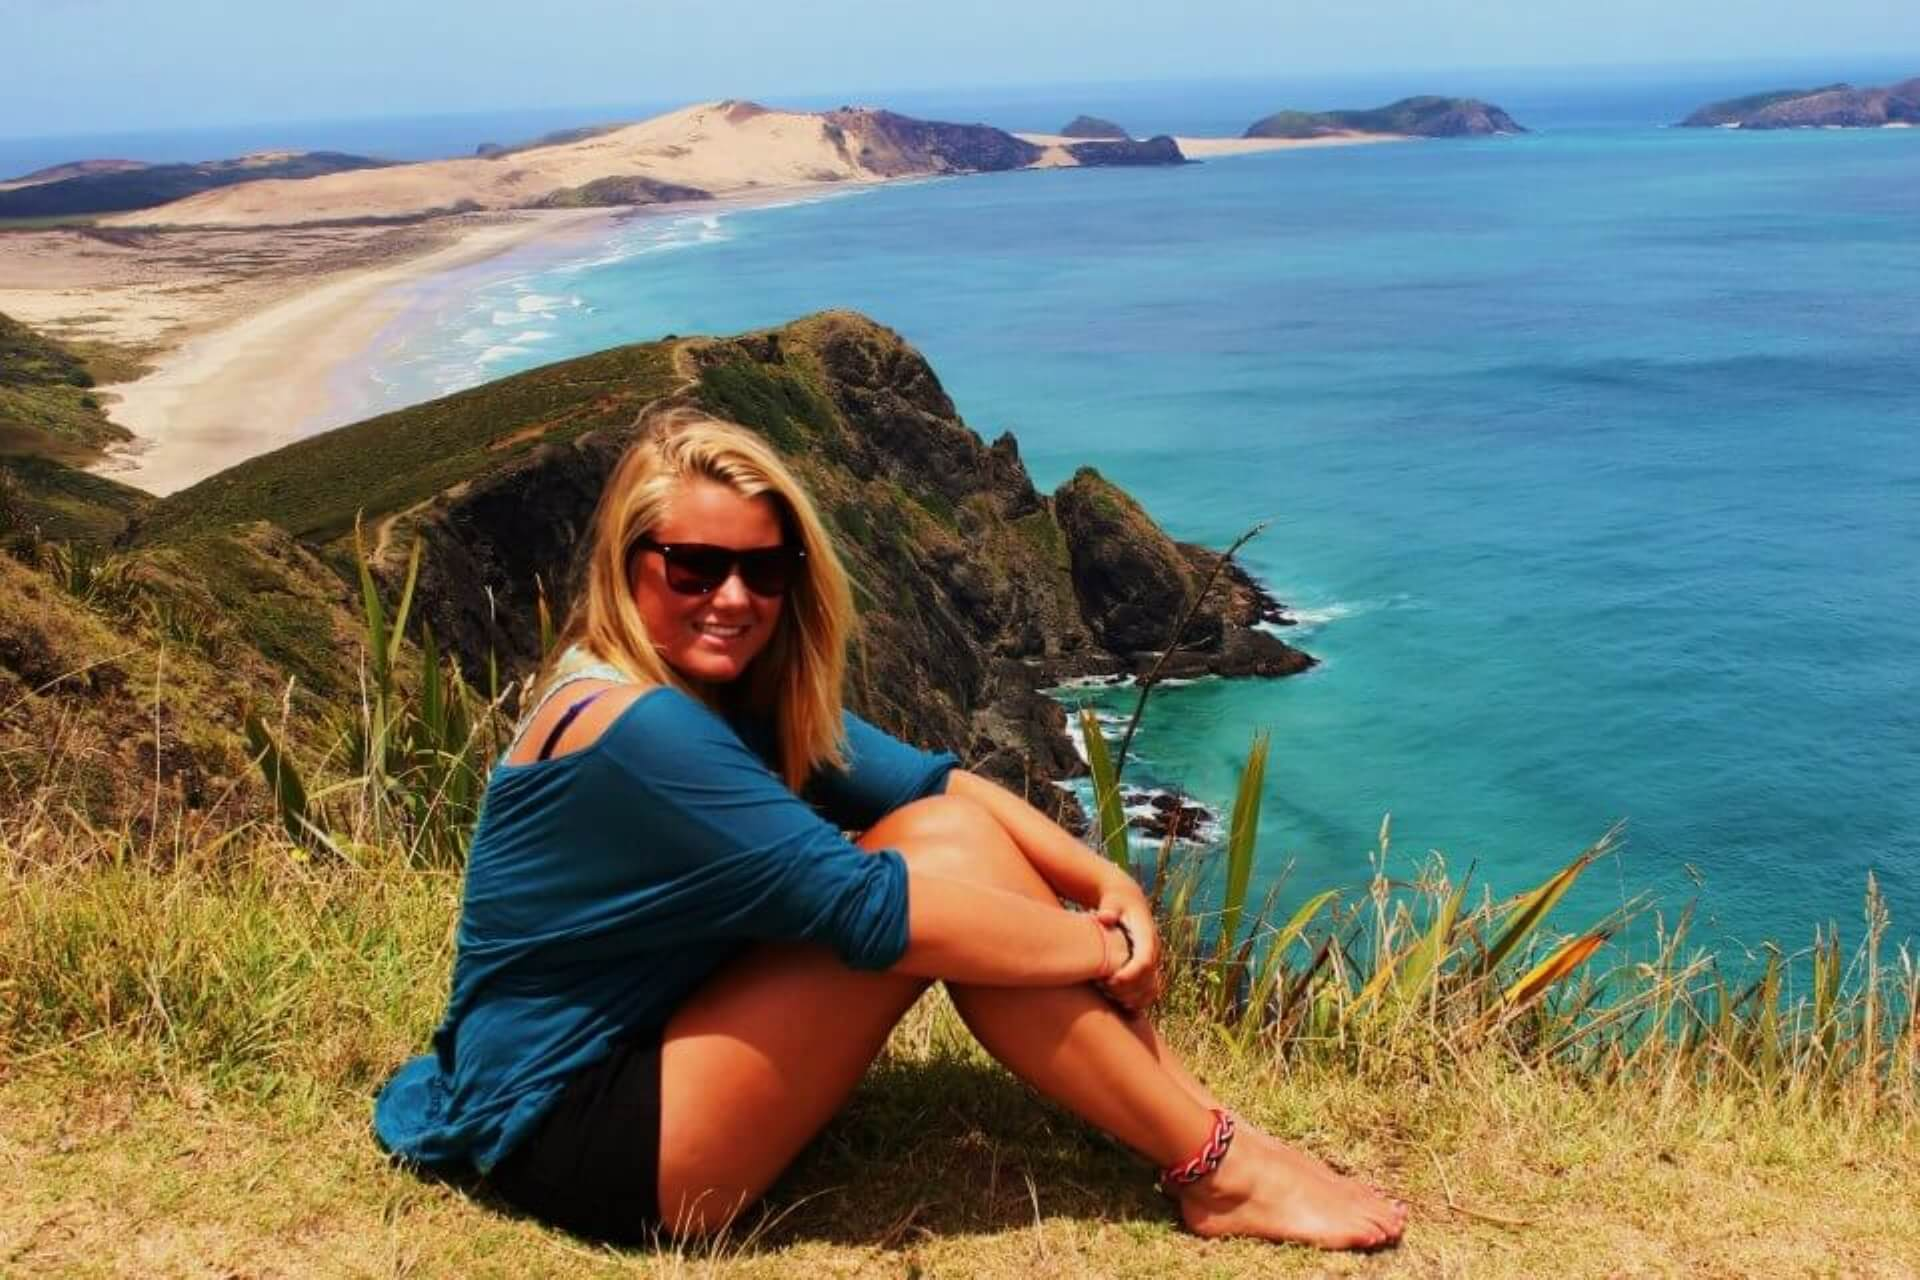 australia Exchange student on a beach in New Zealand